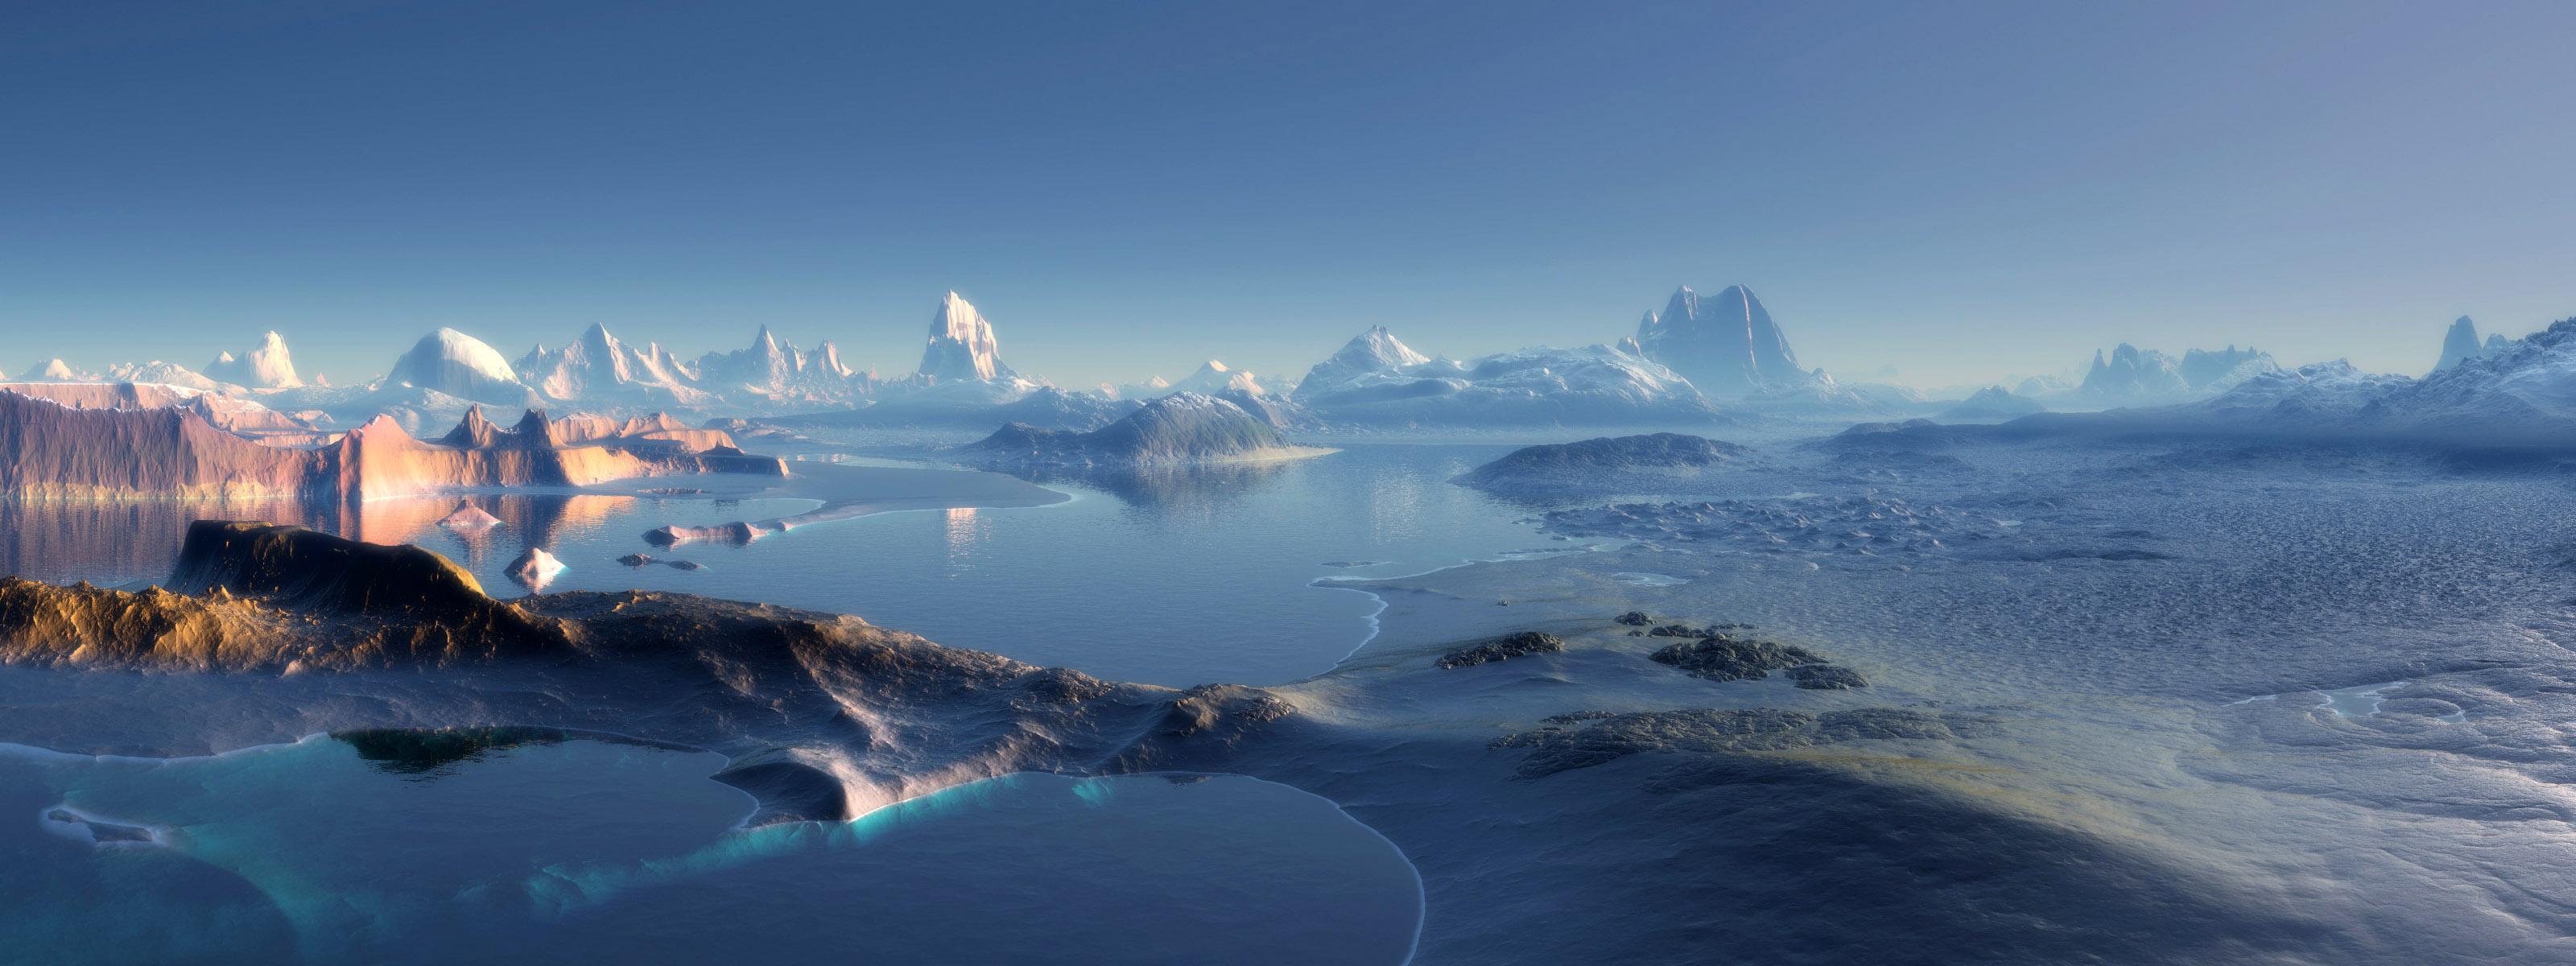 3d screen wallpaper,sky,natural landscape,polar ice cap,arctic ocean,ice